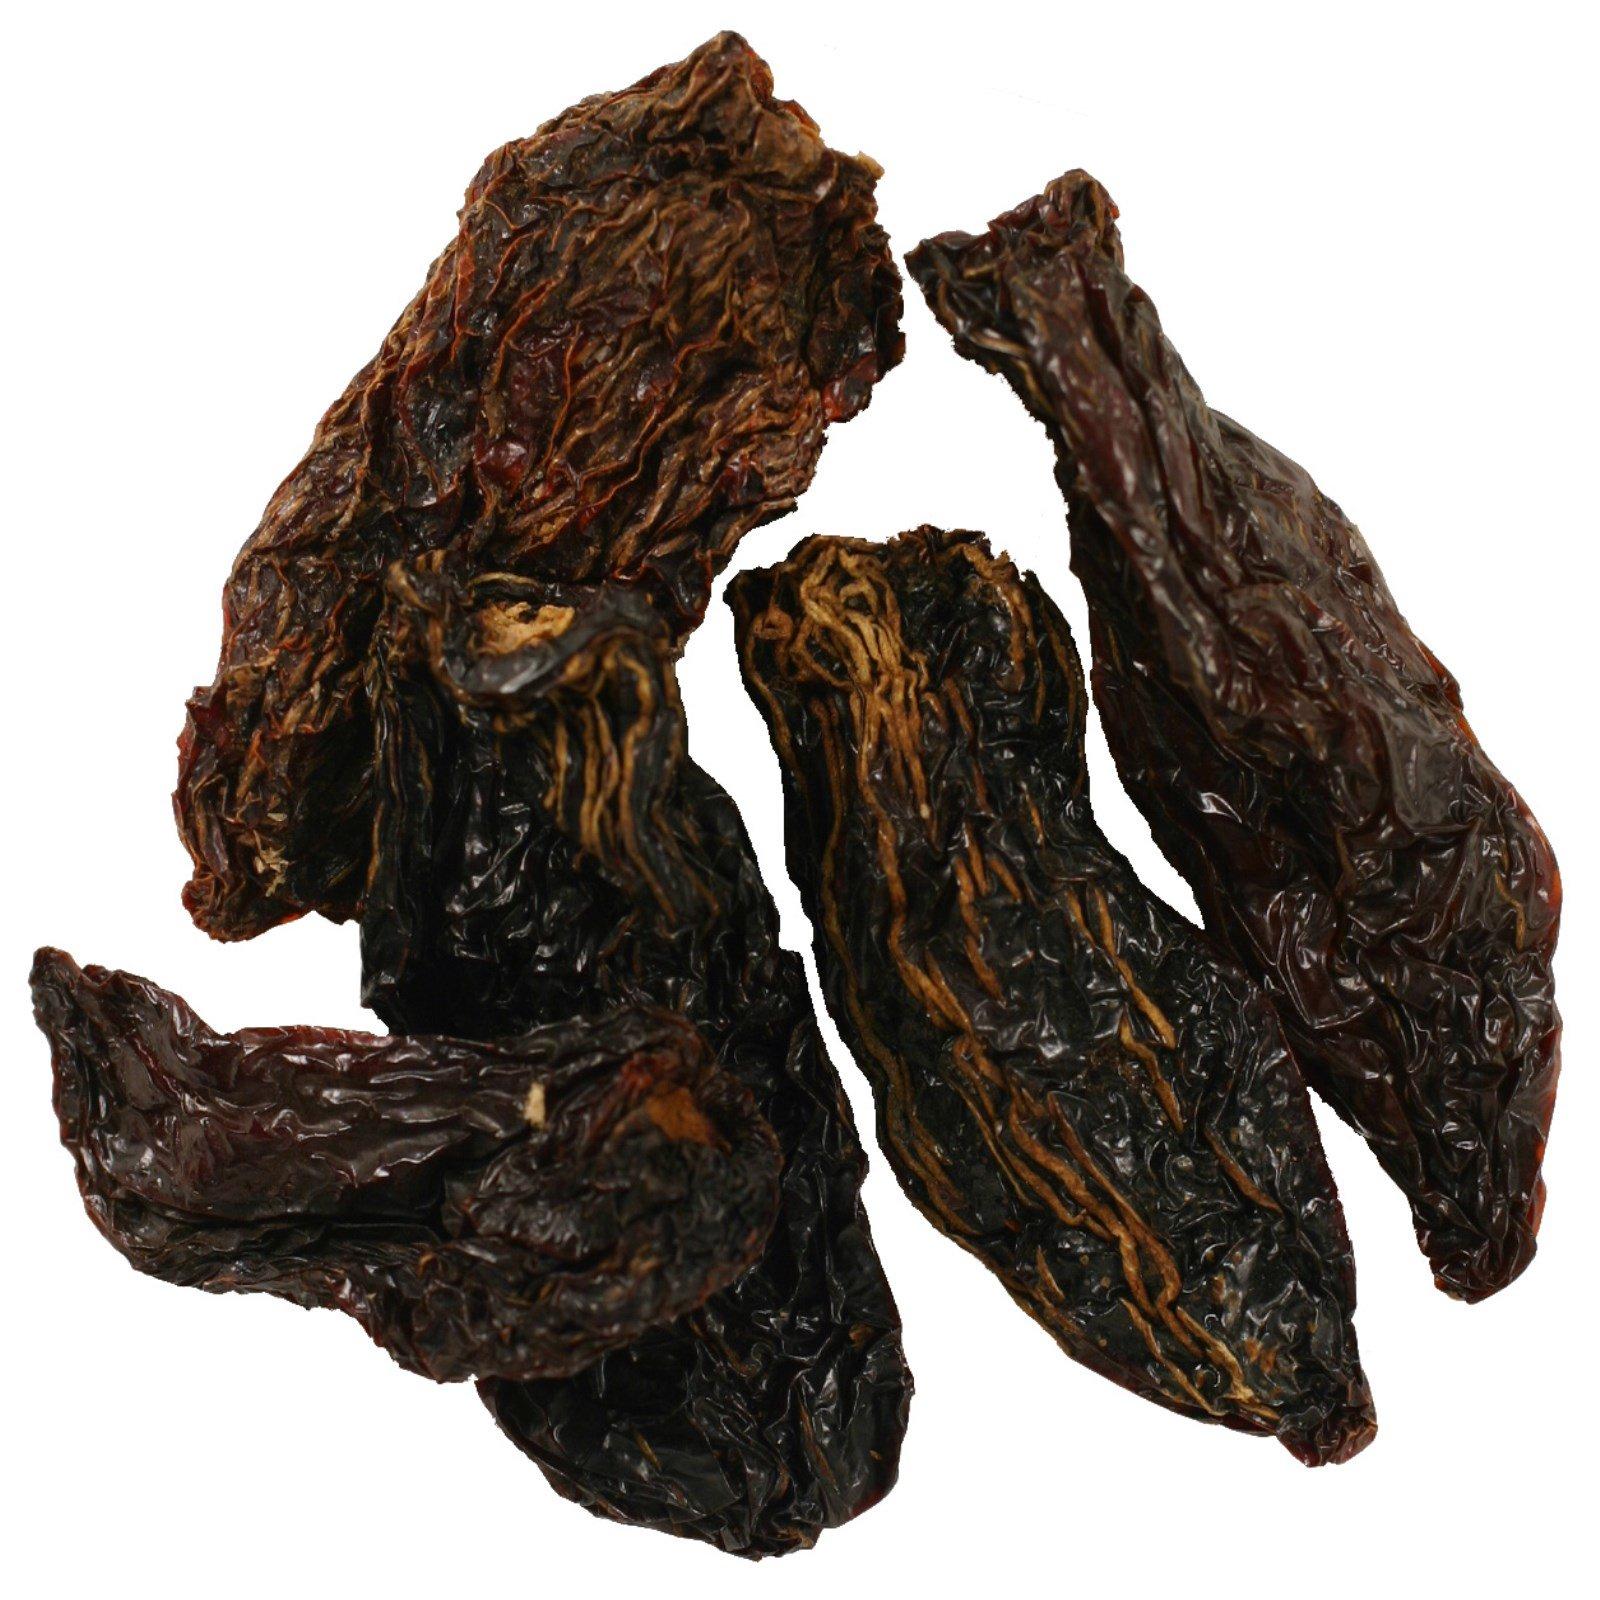 Frontier Natural Products, Цельные сушеные перцы халапеньо, 75,000 тепловых единиц, 16 унций (453 г)